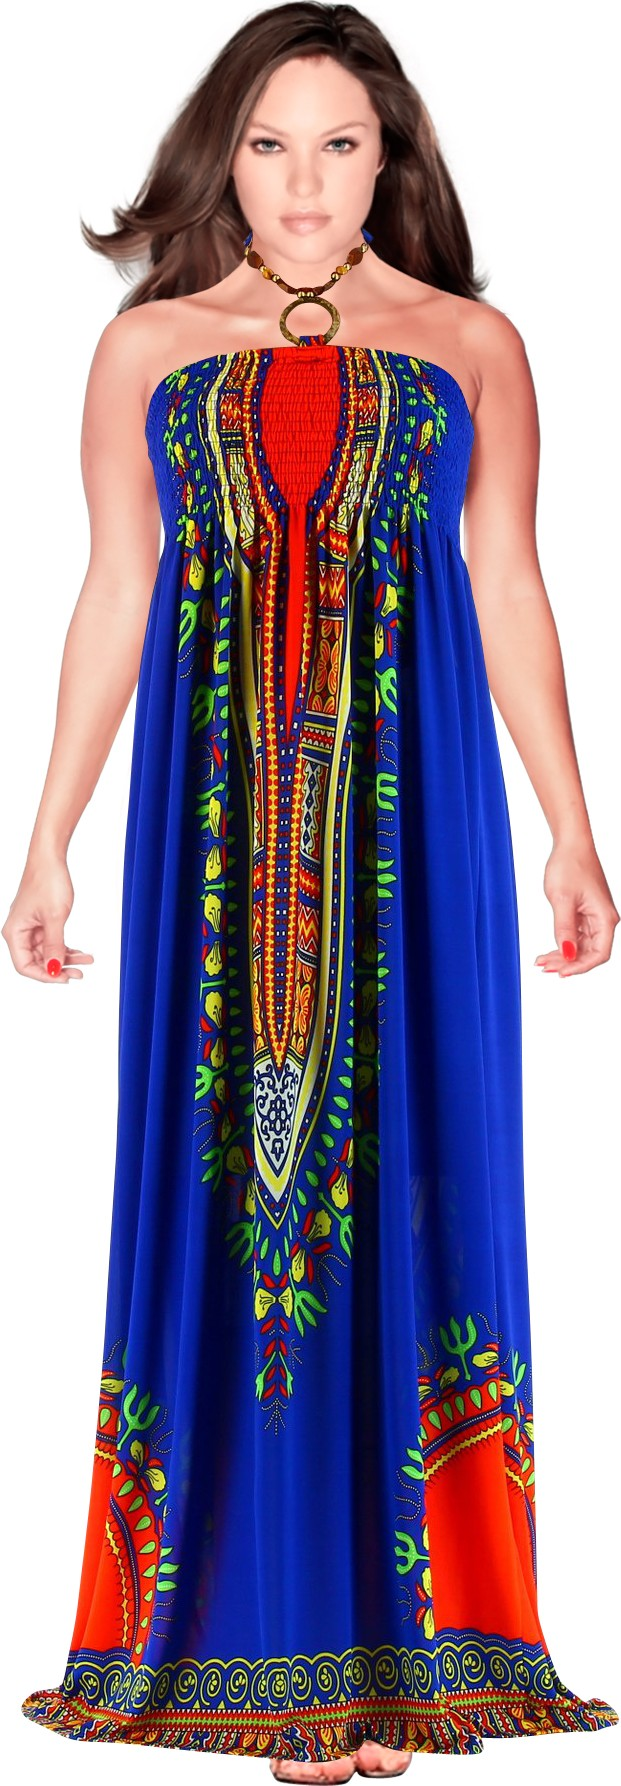 robe longue bustier t boh me ethnique bleu helena bleu. Black Bedroom Furniture Sets. Home Design Ideas